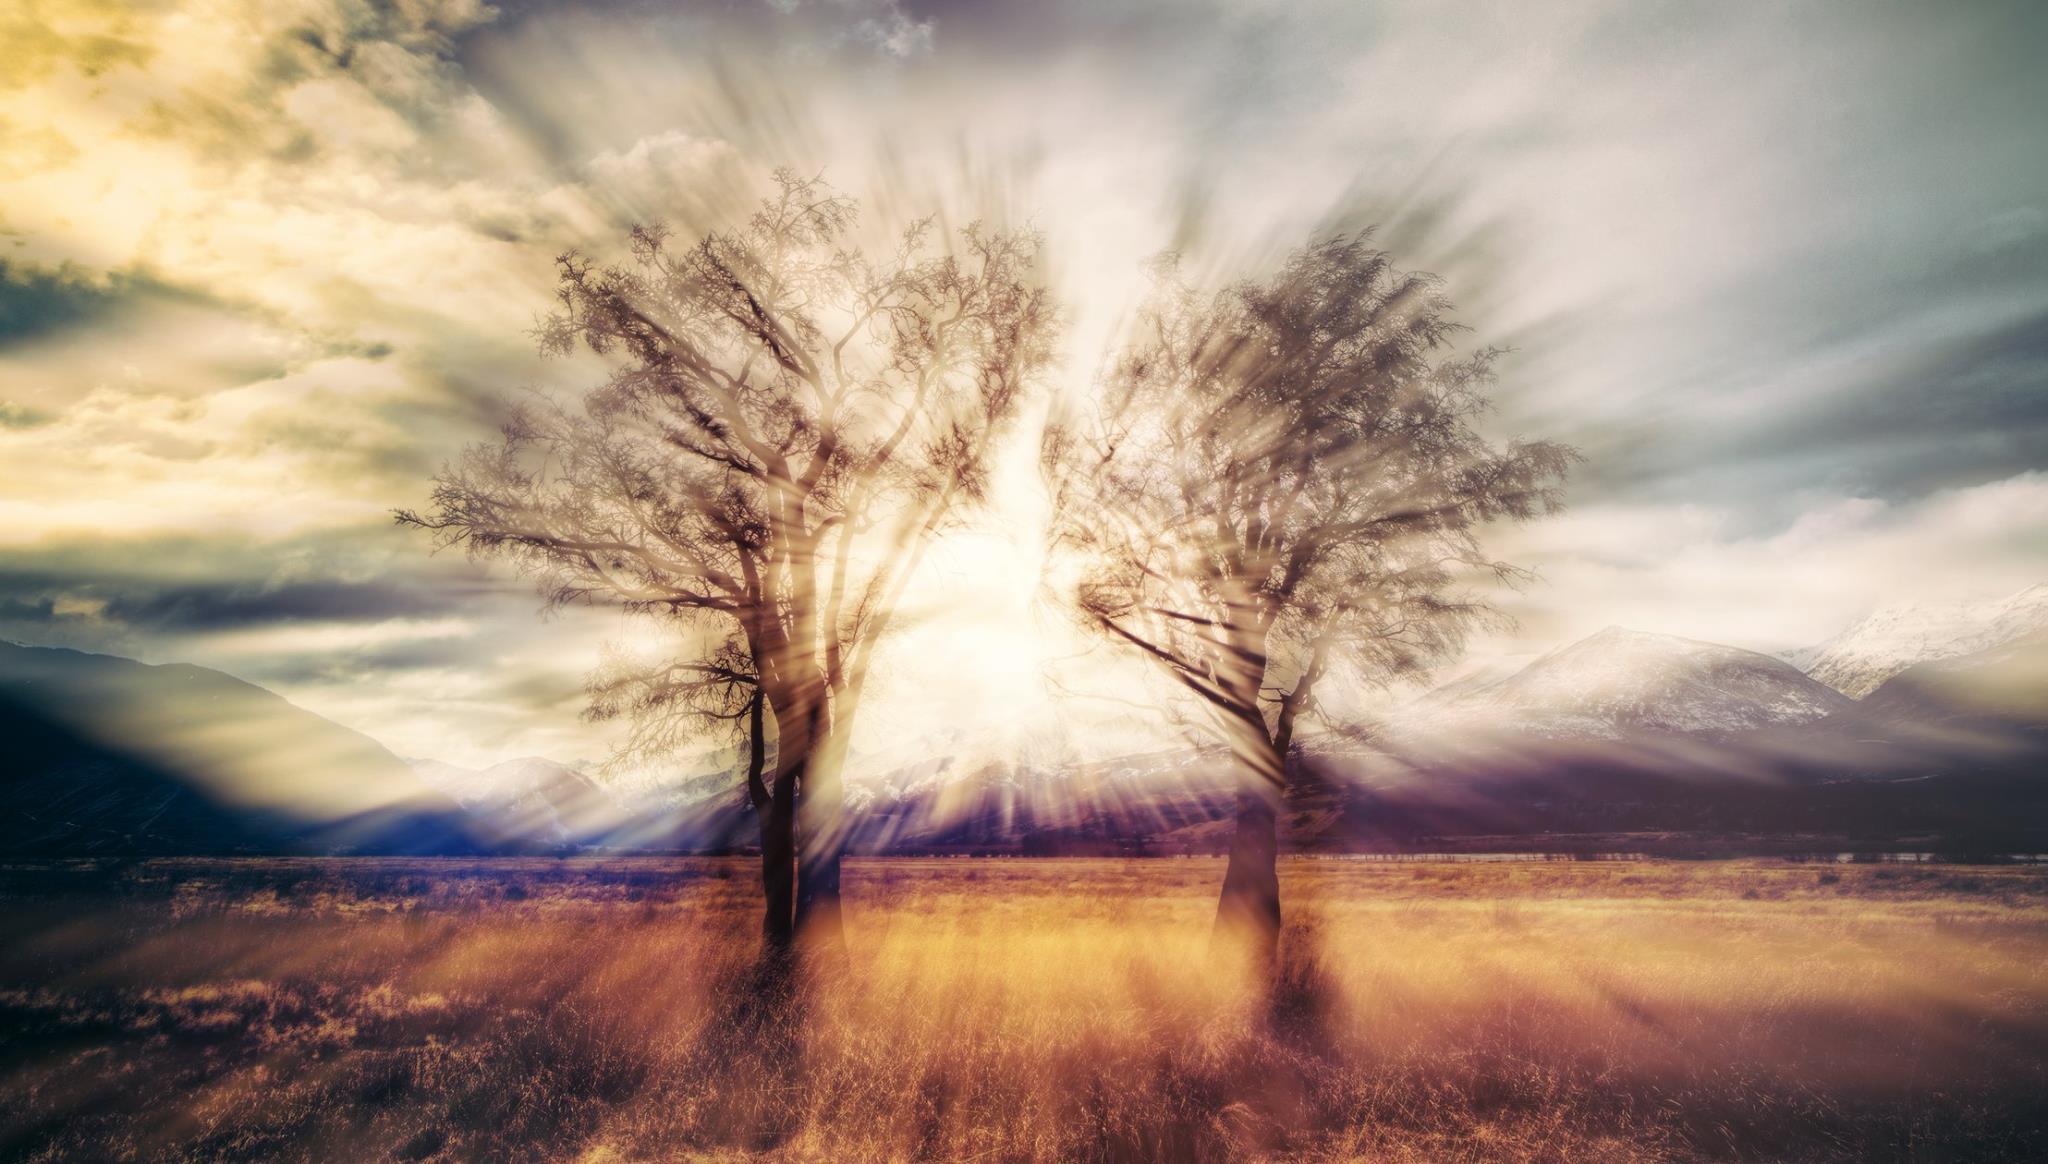 General 2048x1164 Trey Ratcliff HDR landscape digital art nature mountains trees